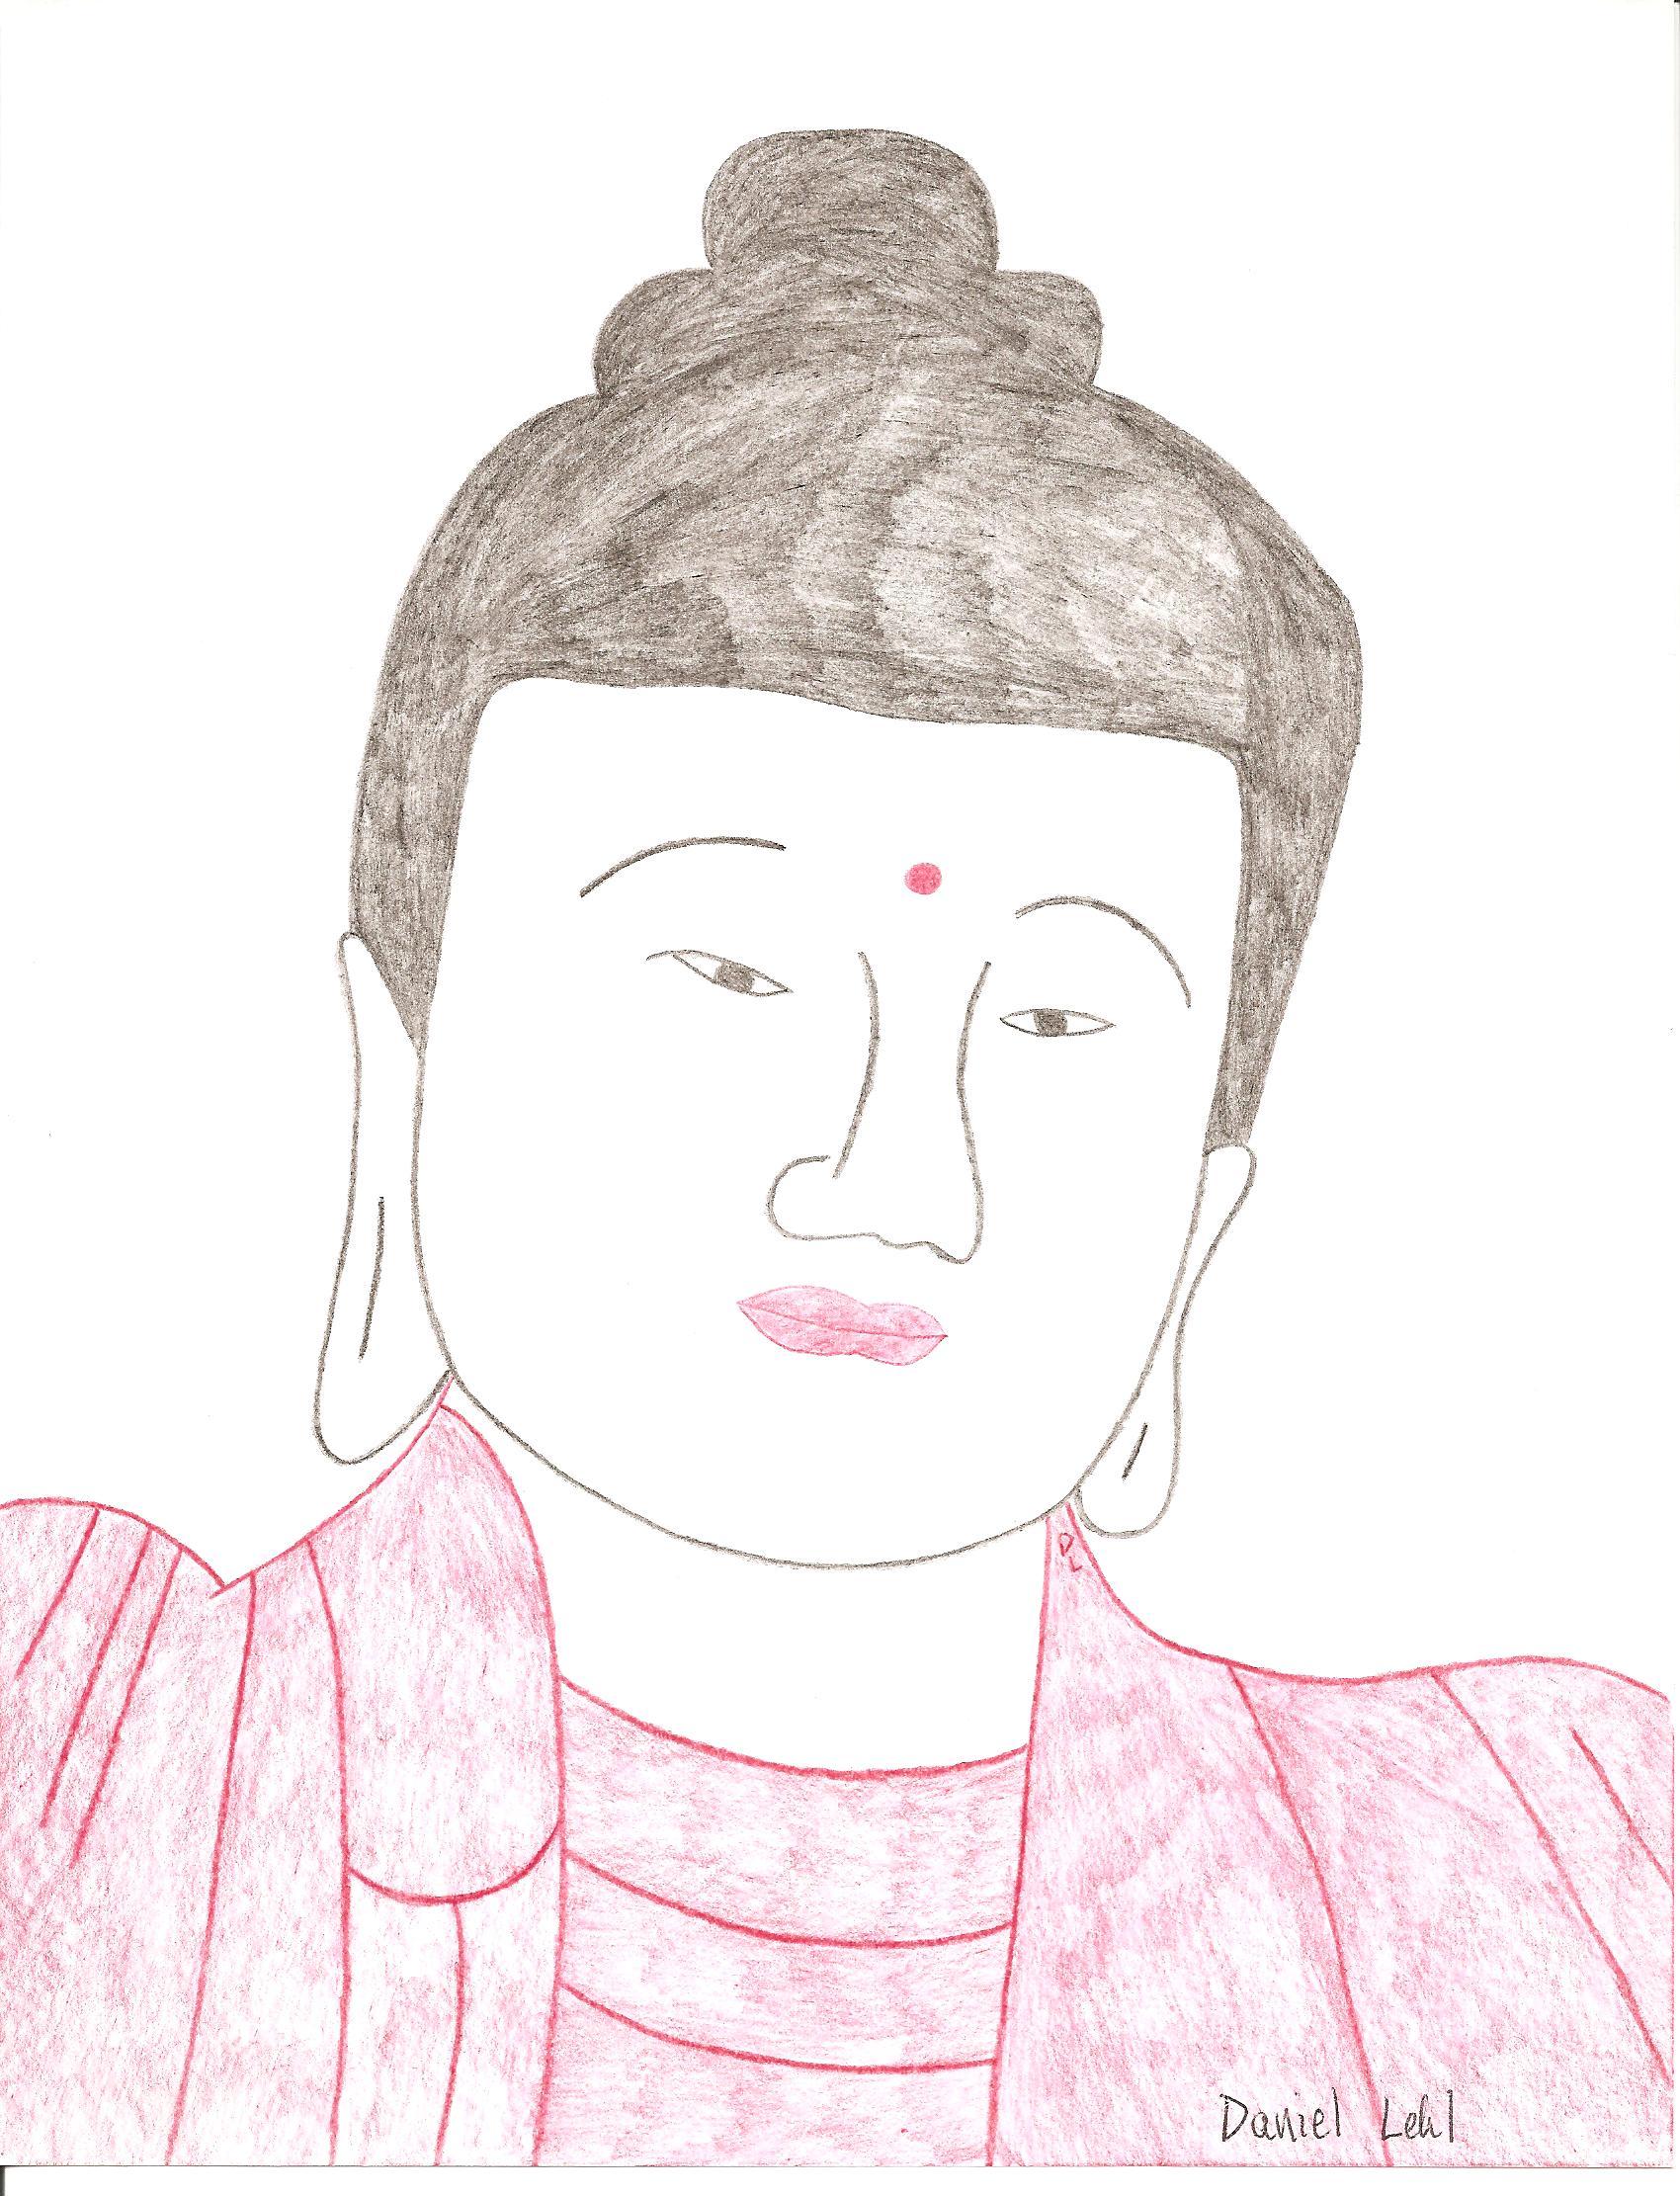 daniel lehl buddha 001.jpg